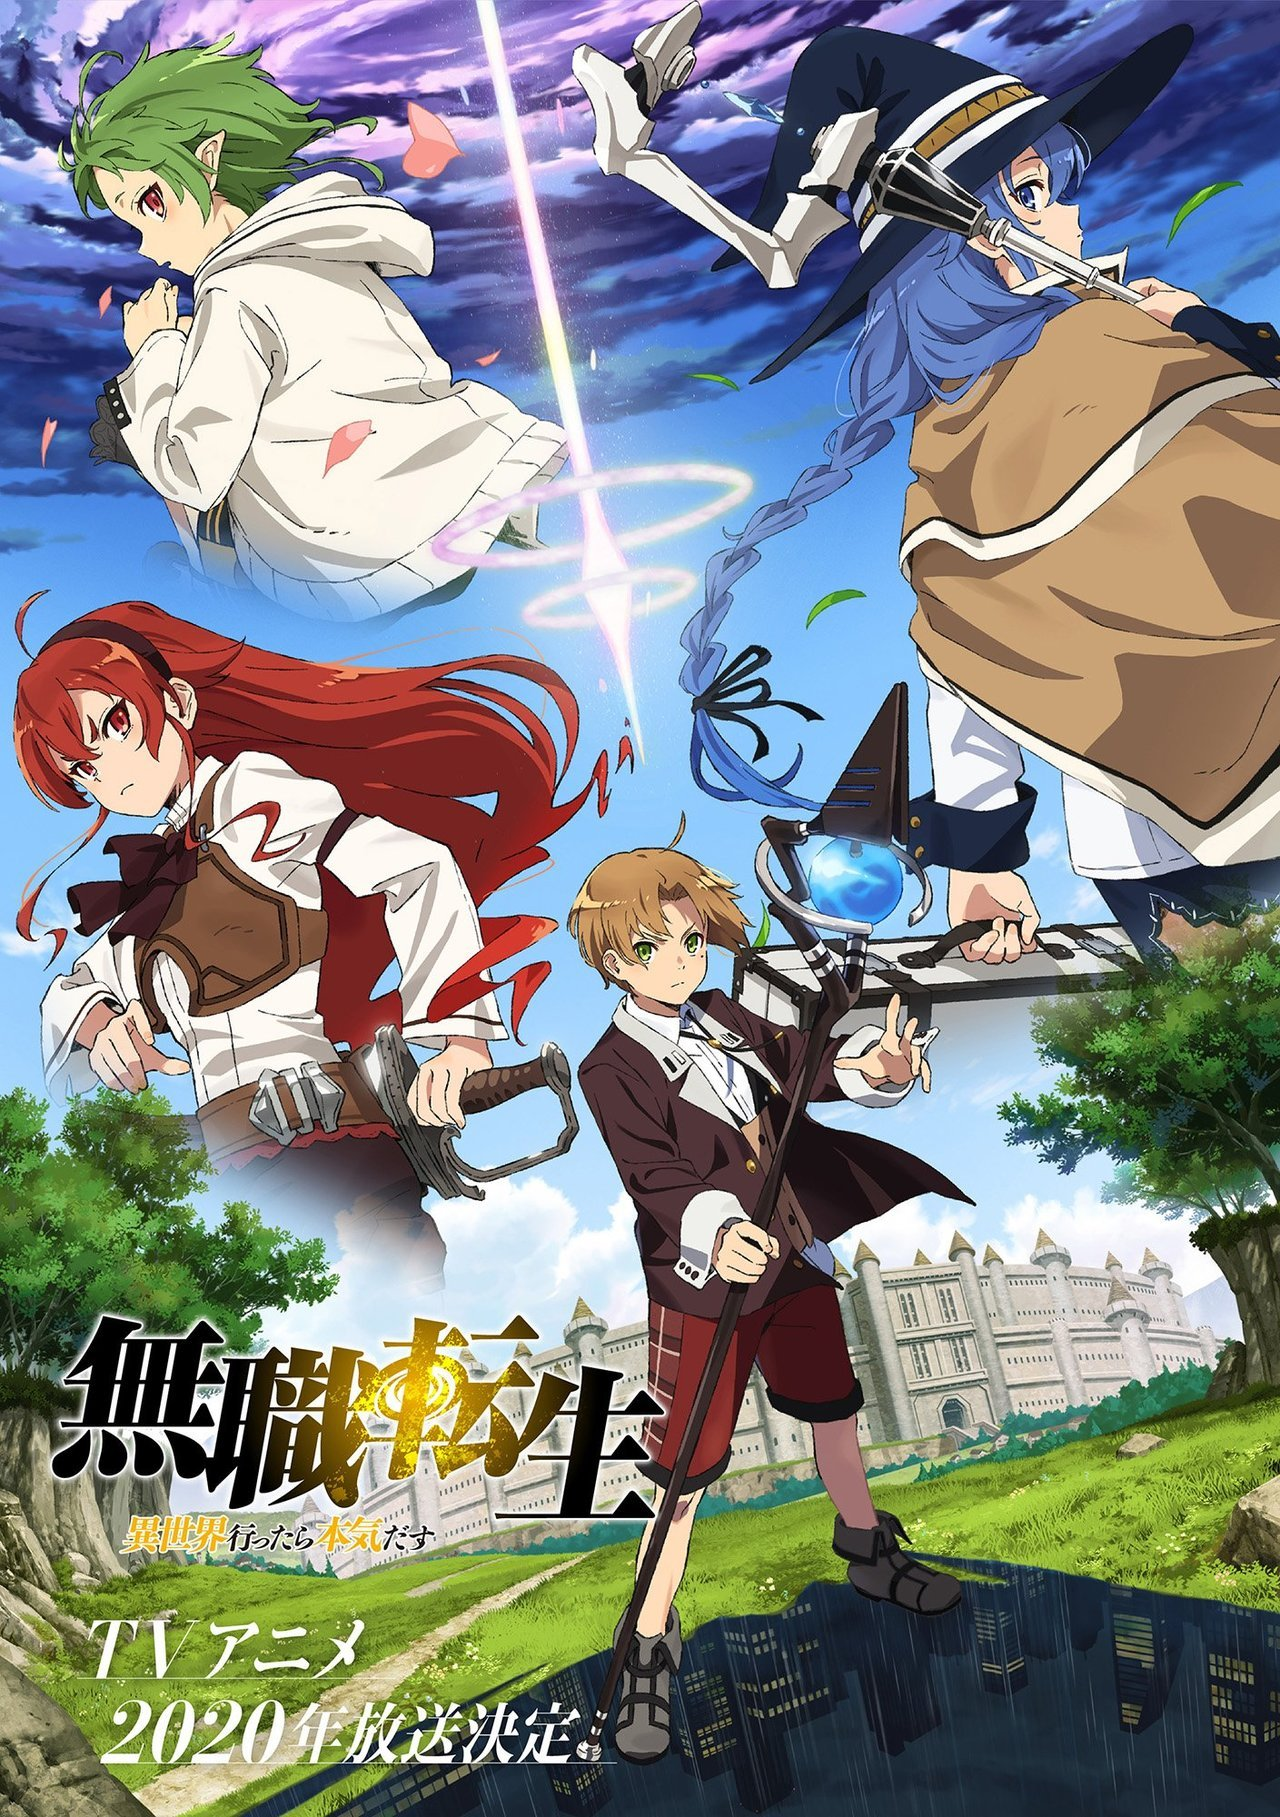 Mushoku Tensei Affiche Anime